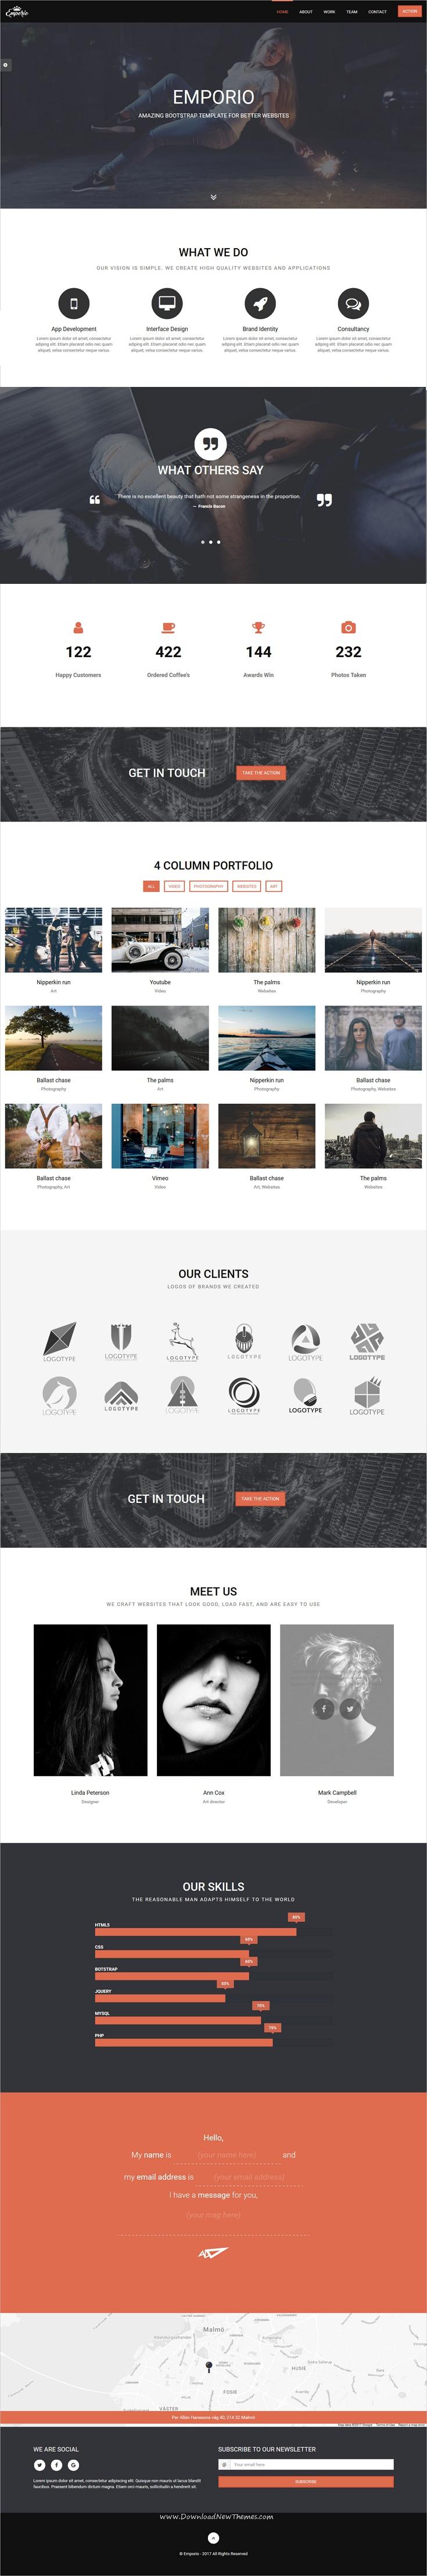 Emporio - Multipurpose One Page Template | Template and Portfolio ...